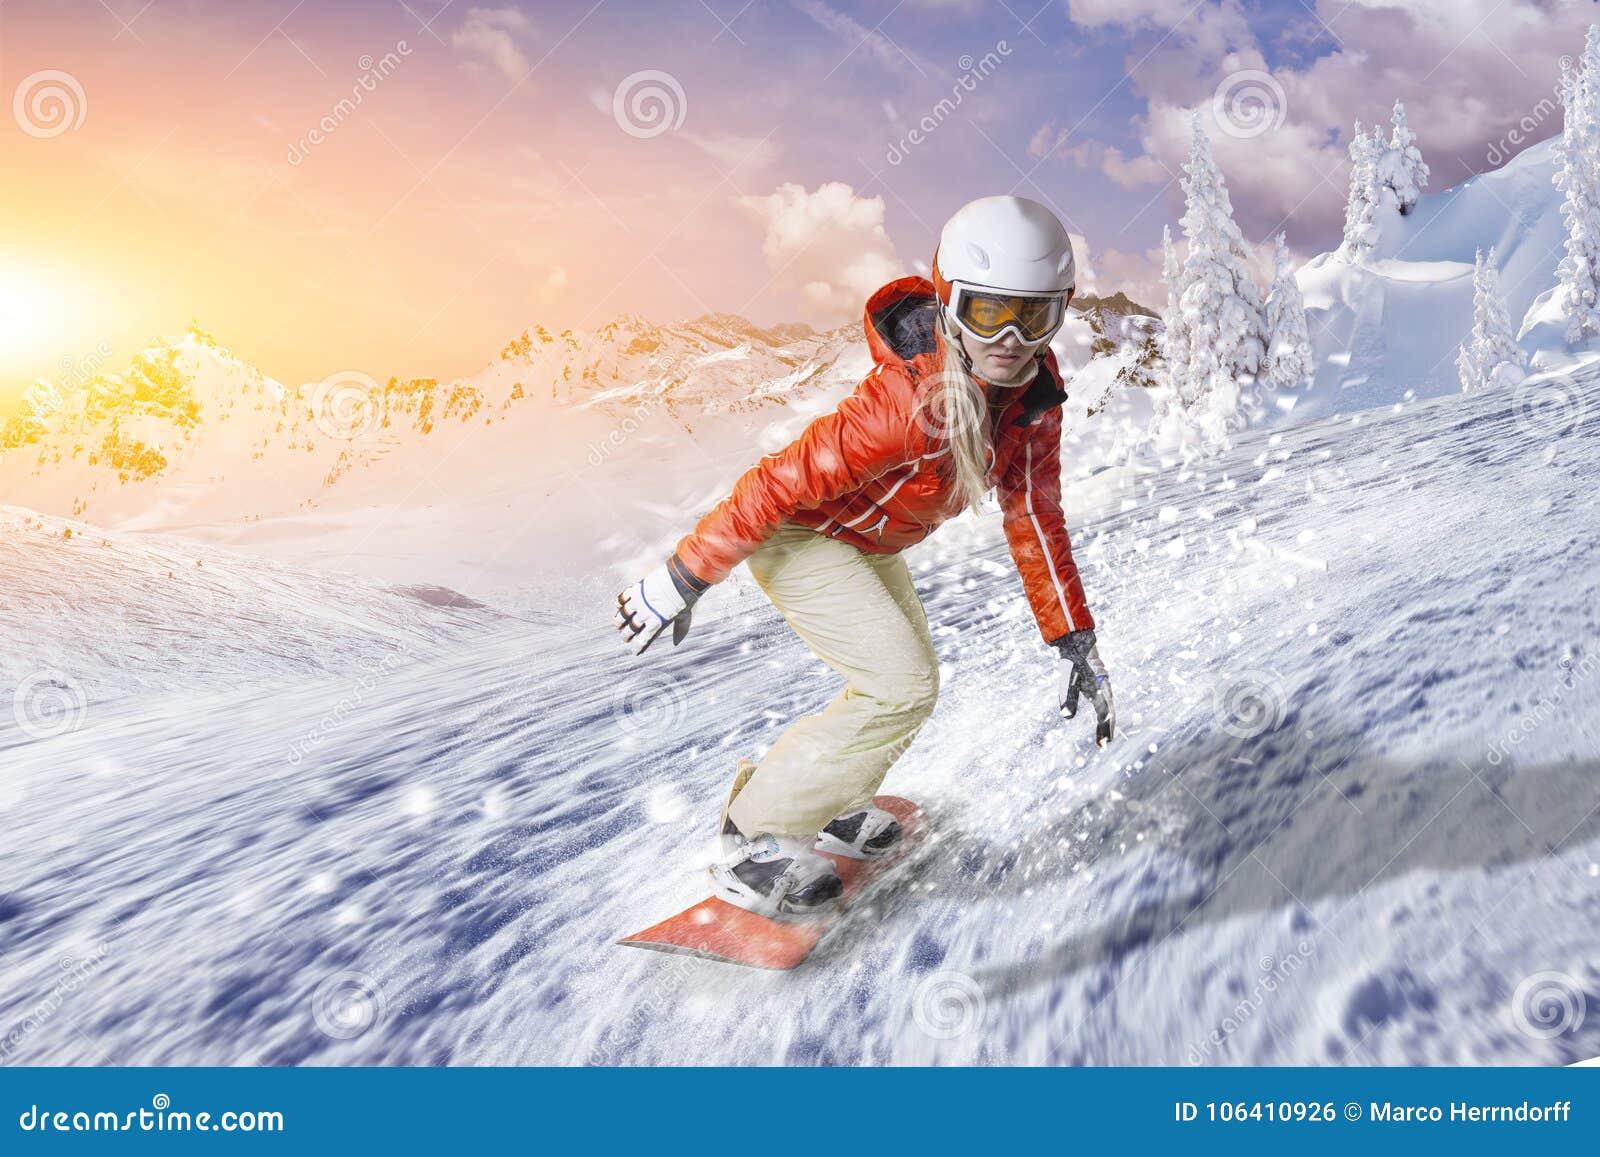 Snowboarder Glides With High Speed Downhill Through The Powder Snow ...